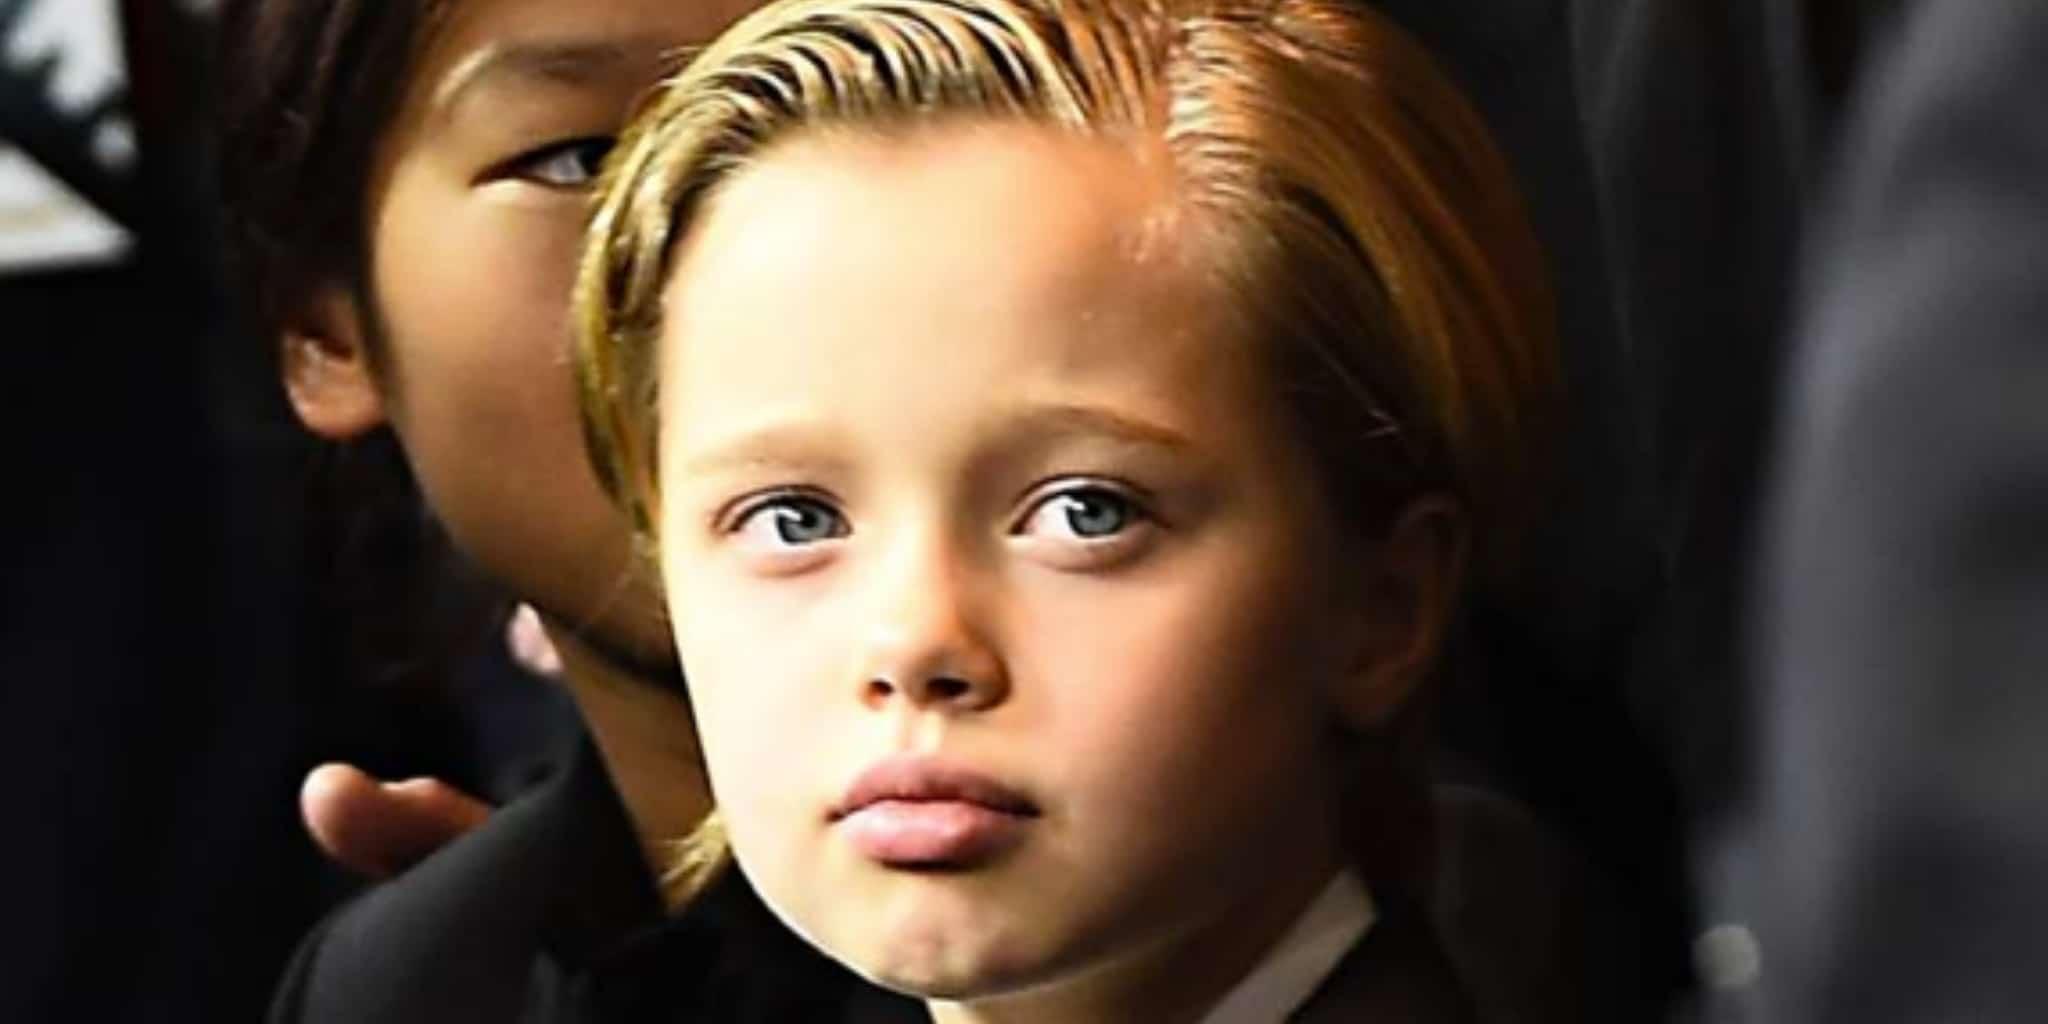 John Jolie-Pitt: Gender transition, parents, surgery, siblings